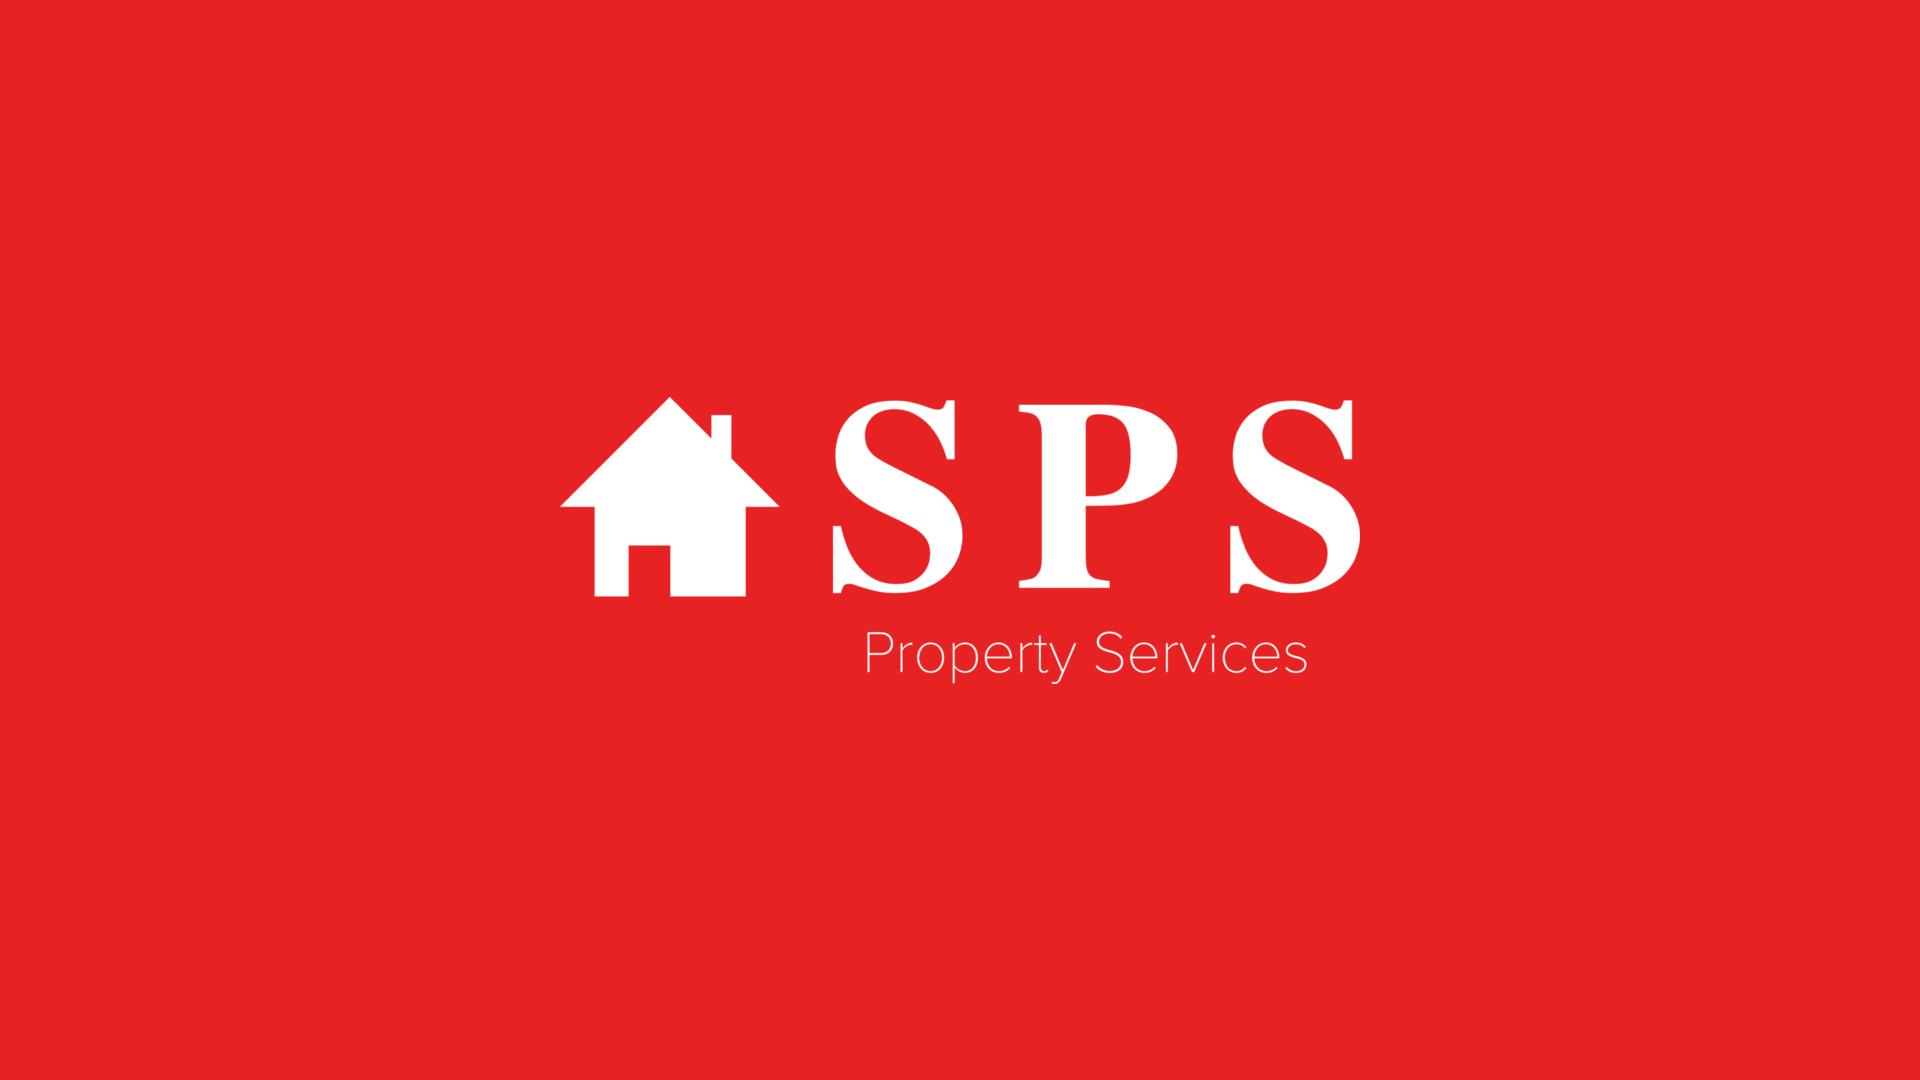 SPS Property Services